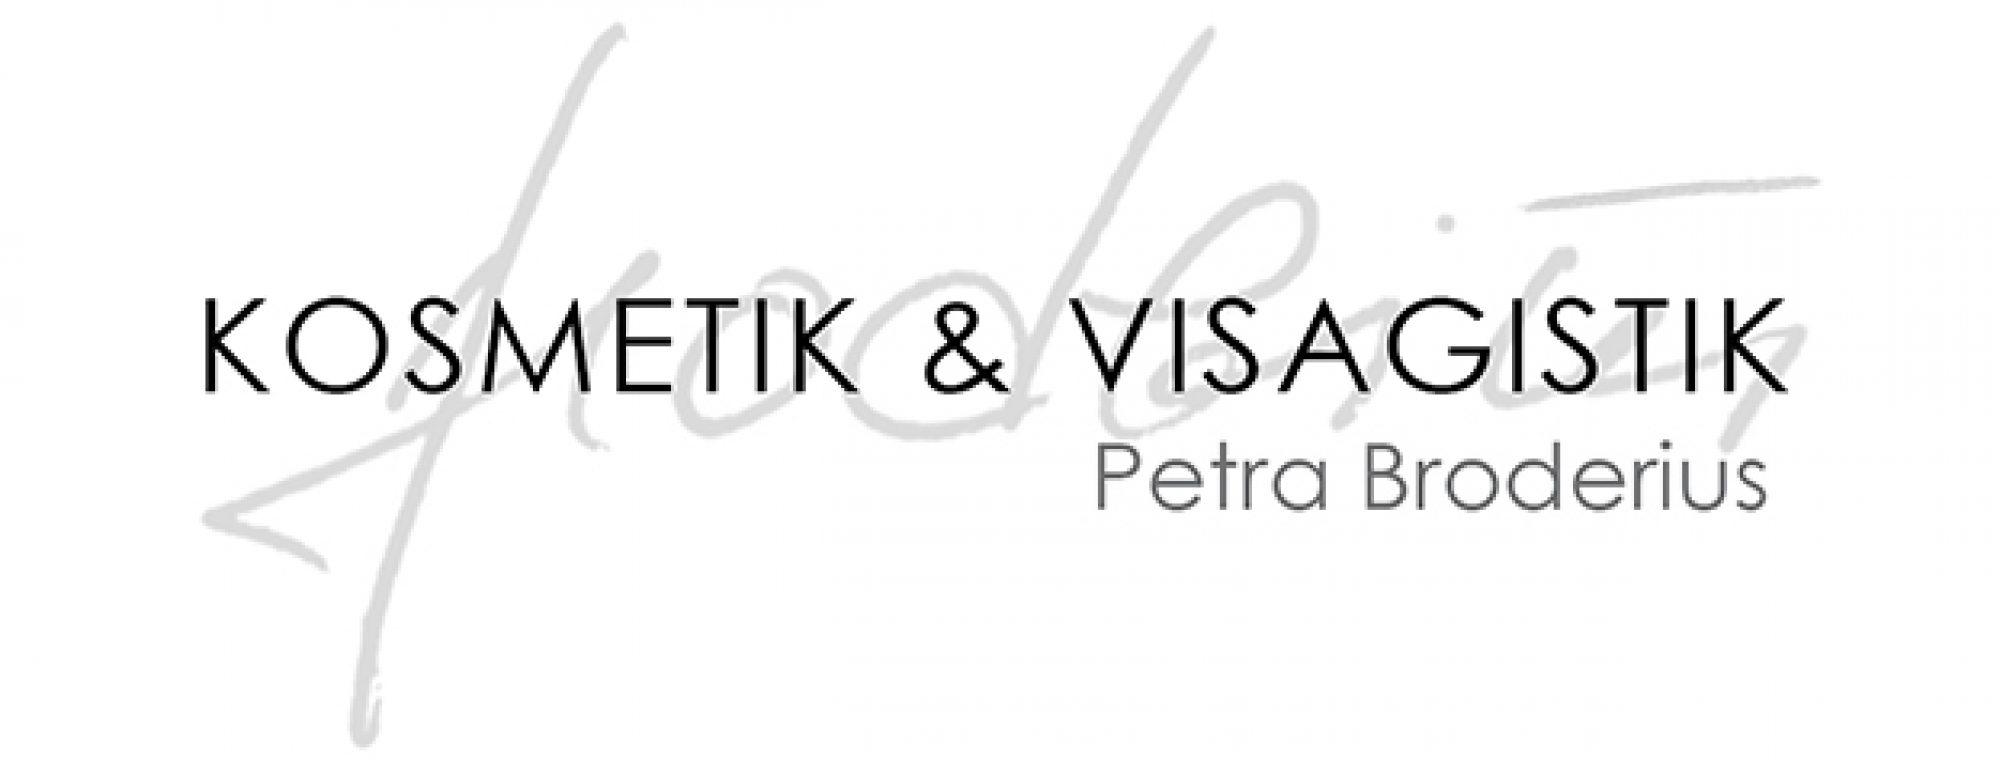 Kosmetik & Visagistik – Petra Broderius – Lübeck